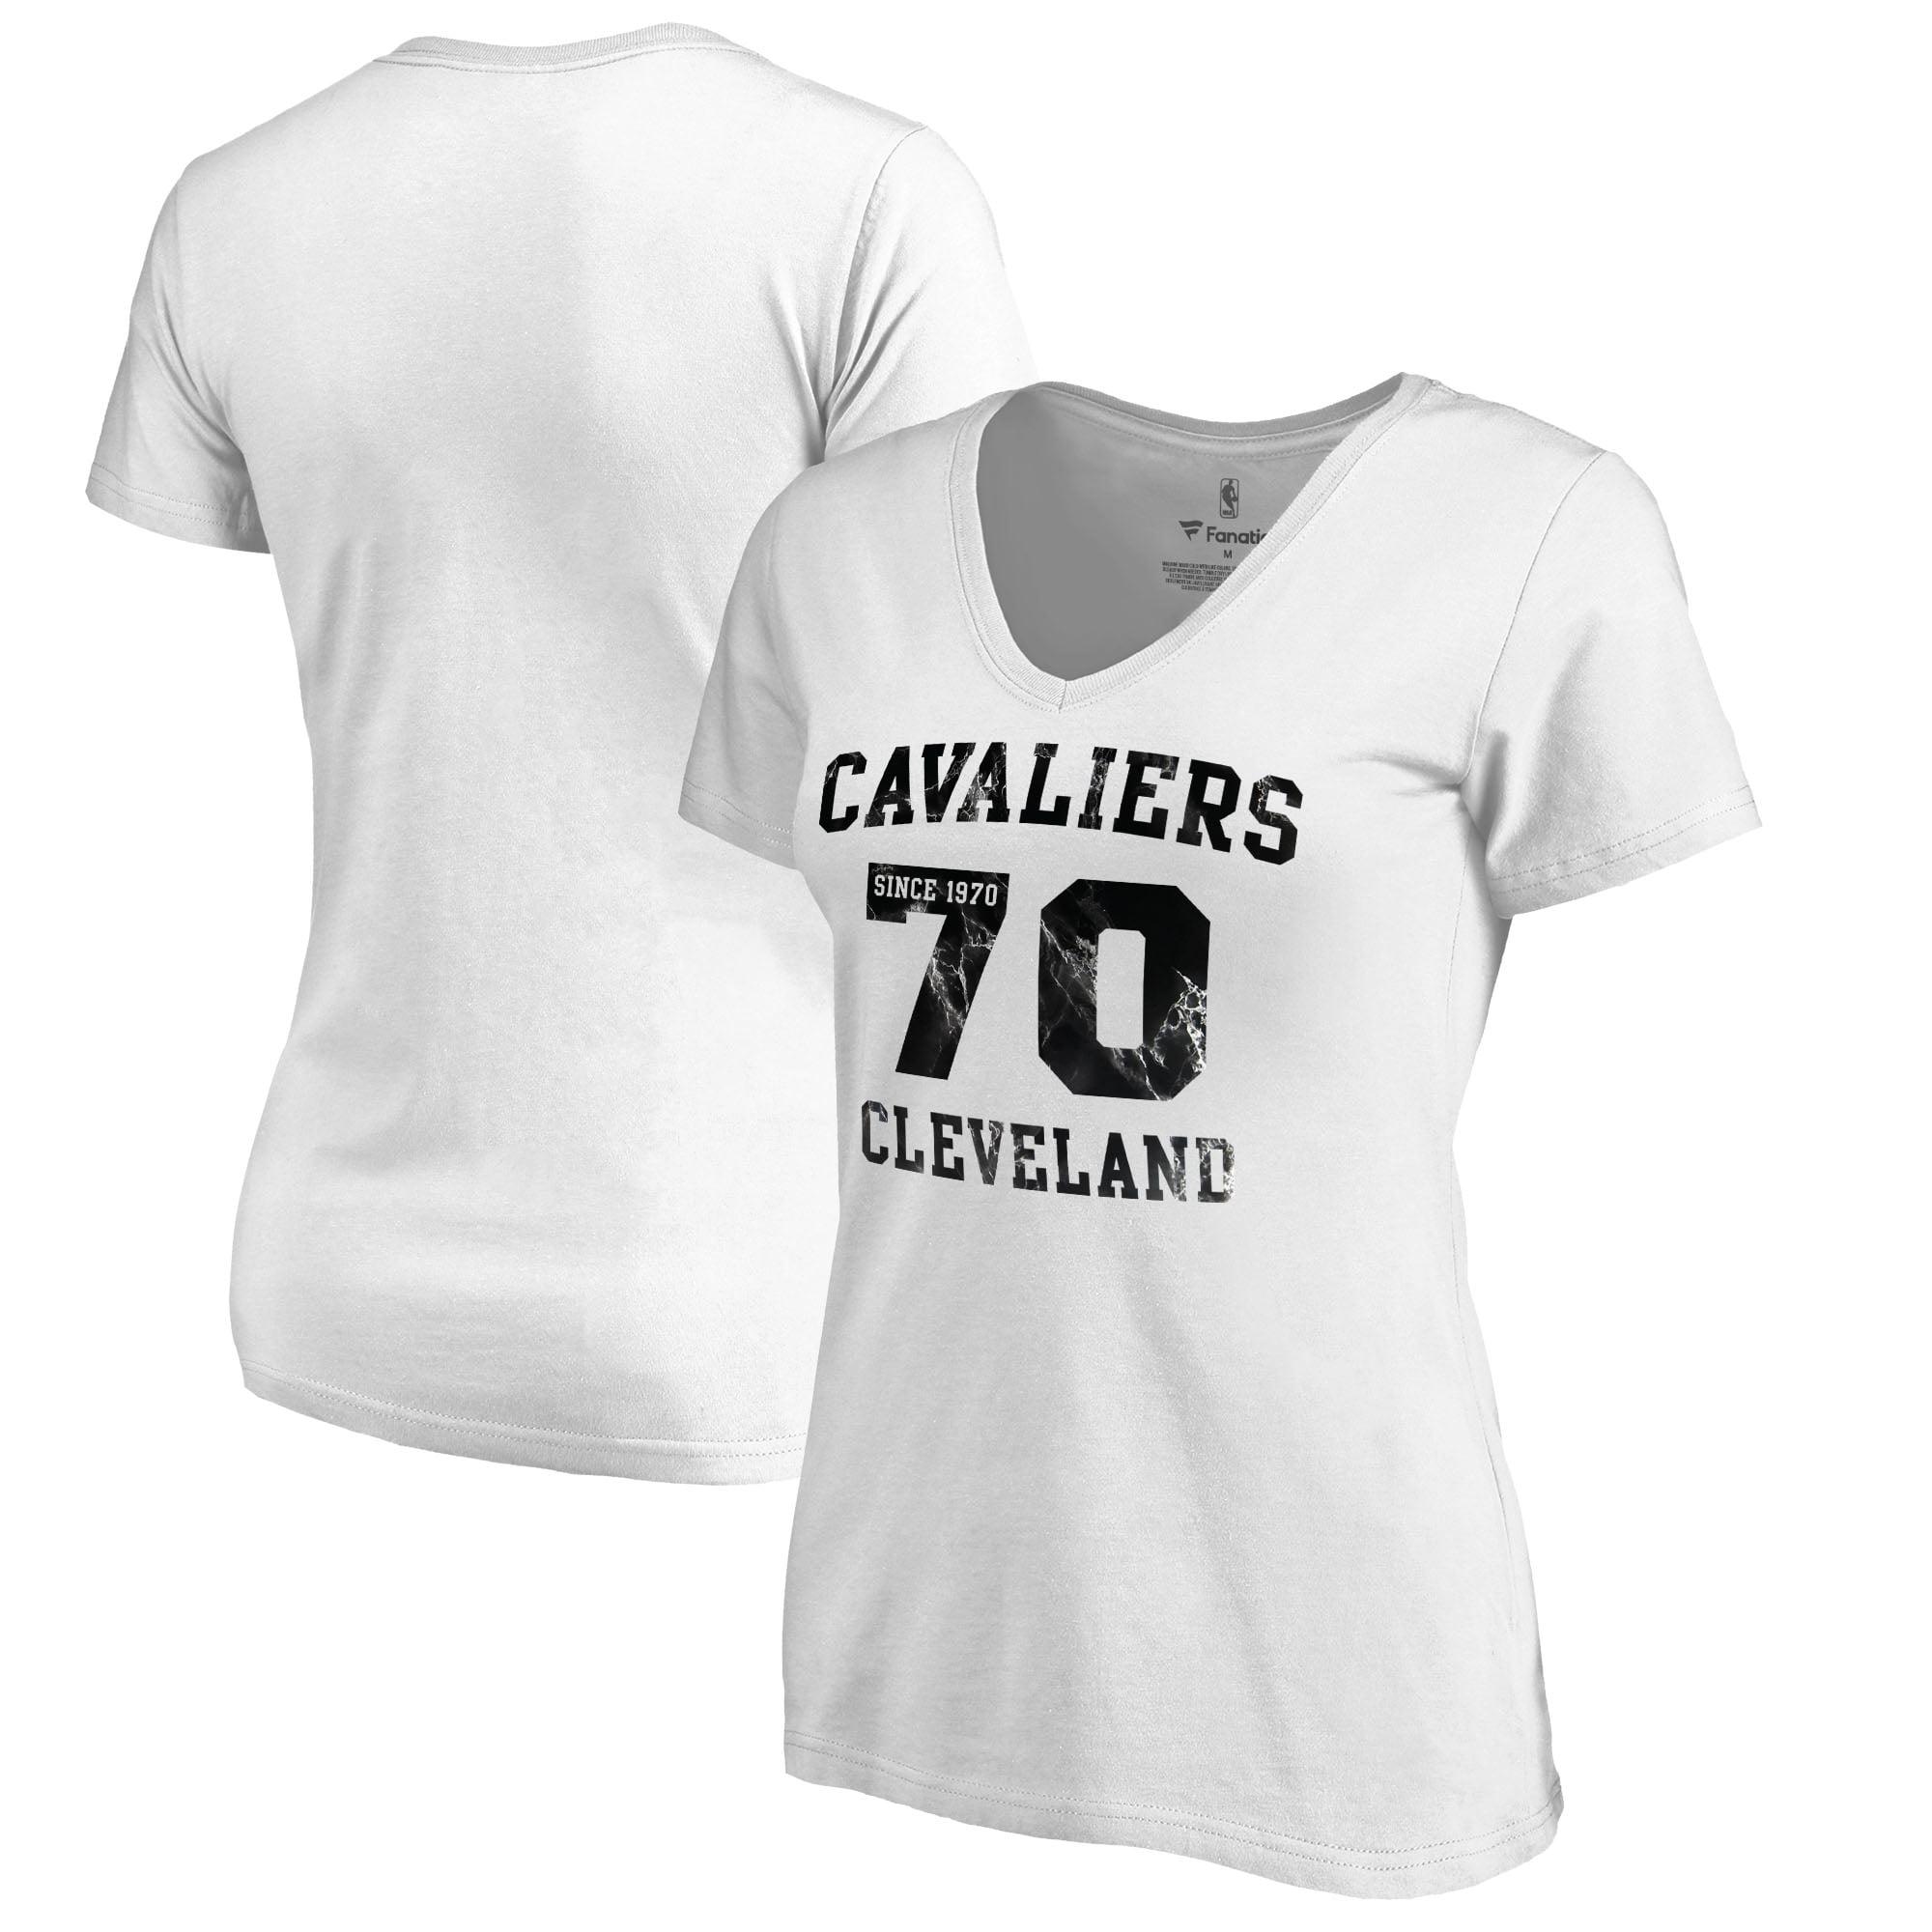 Cleveland Cavaliers Fanatics Branded Women's Hang Time Plus Size V-Neck T-Shirt - White